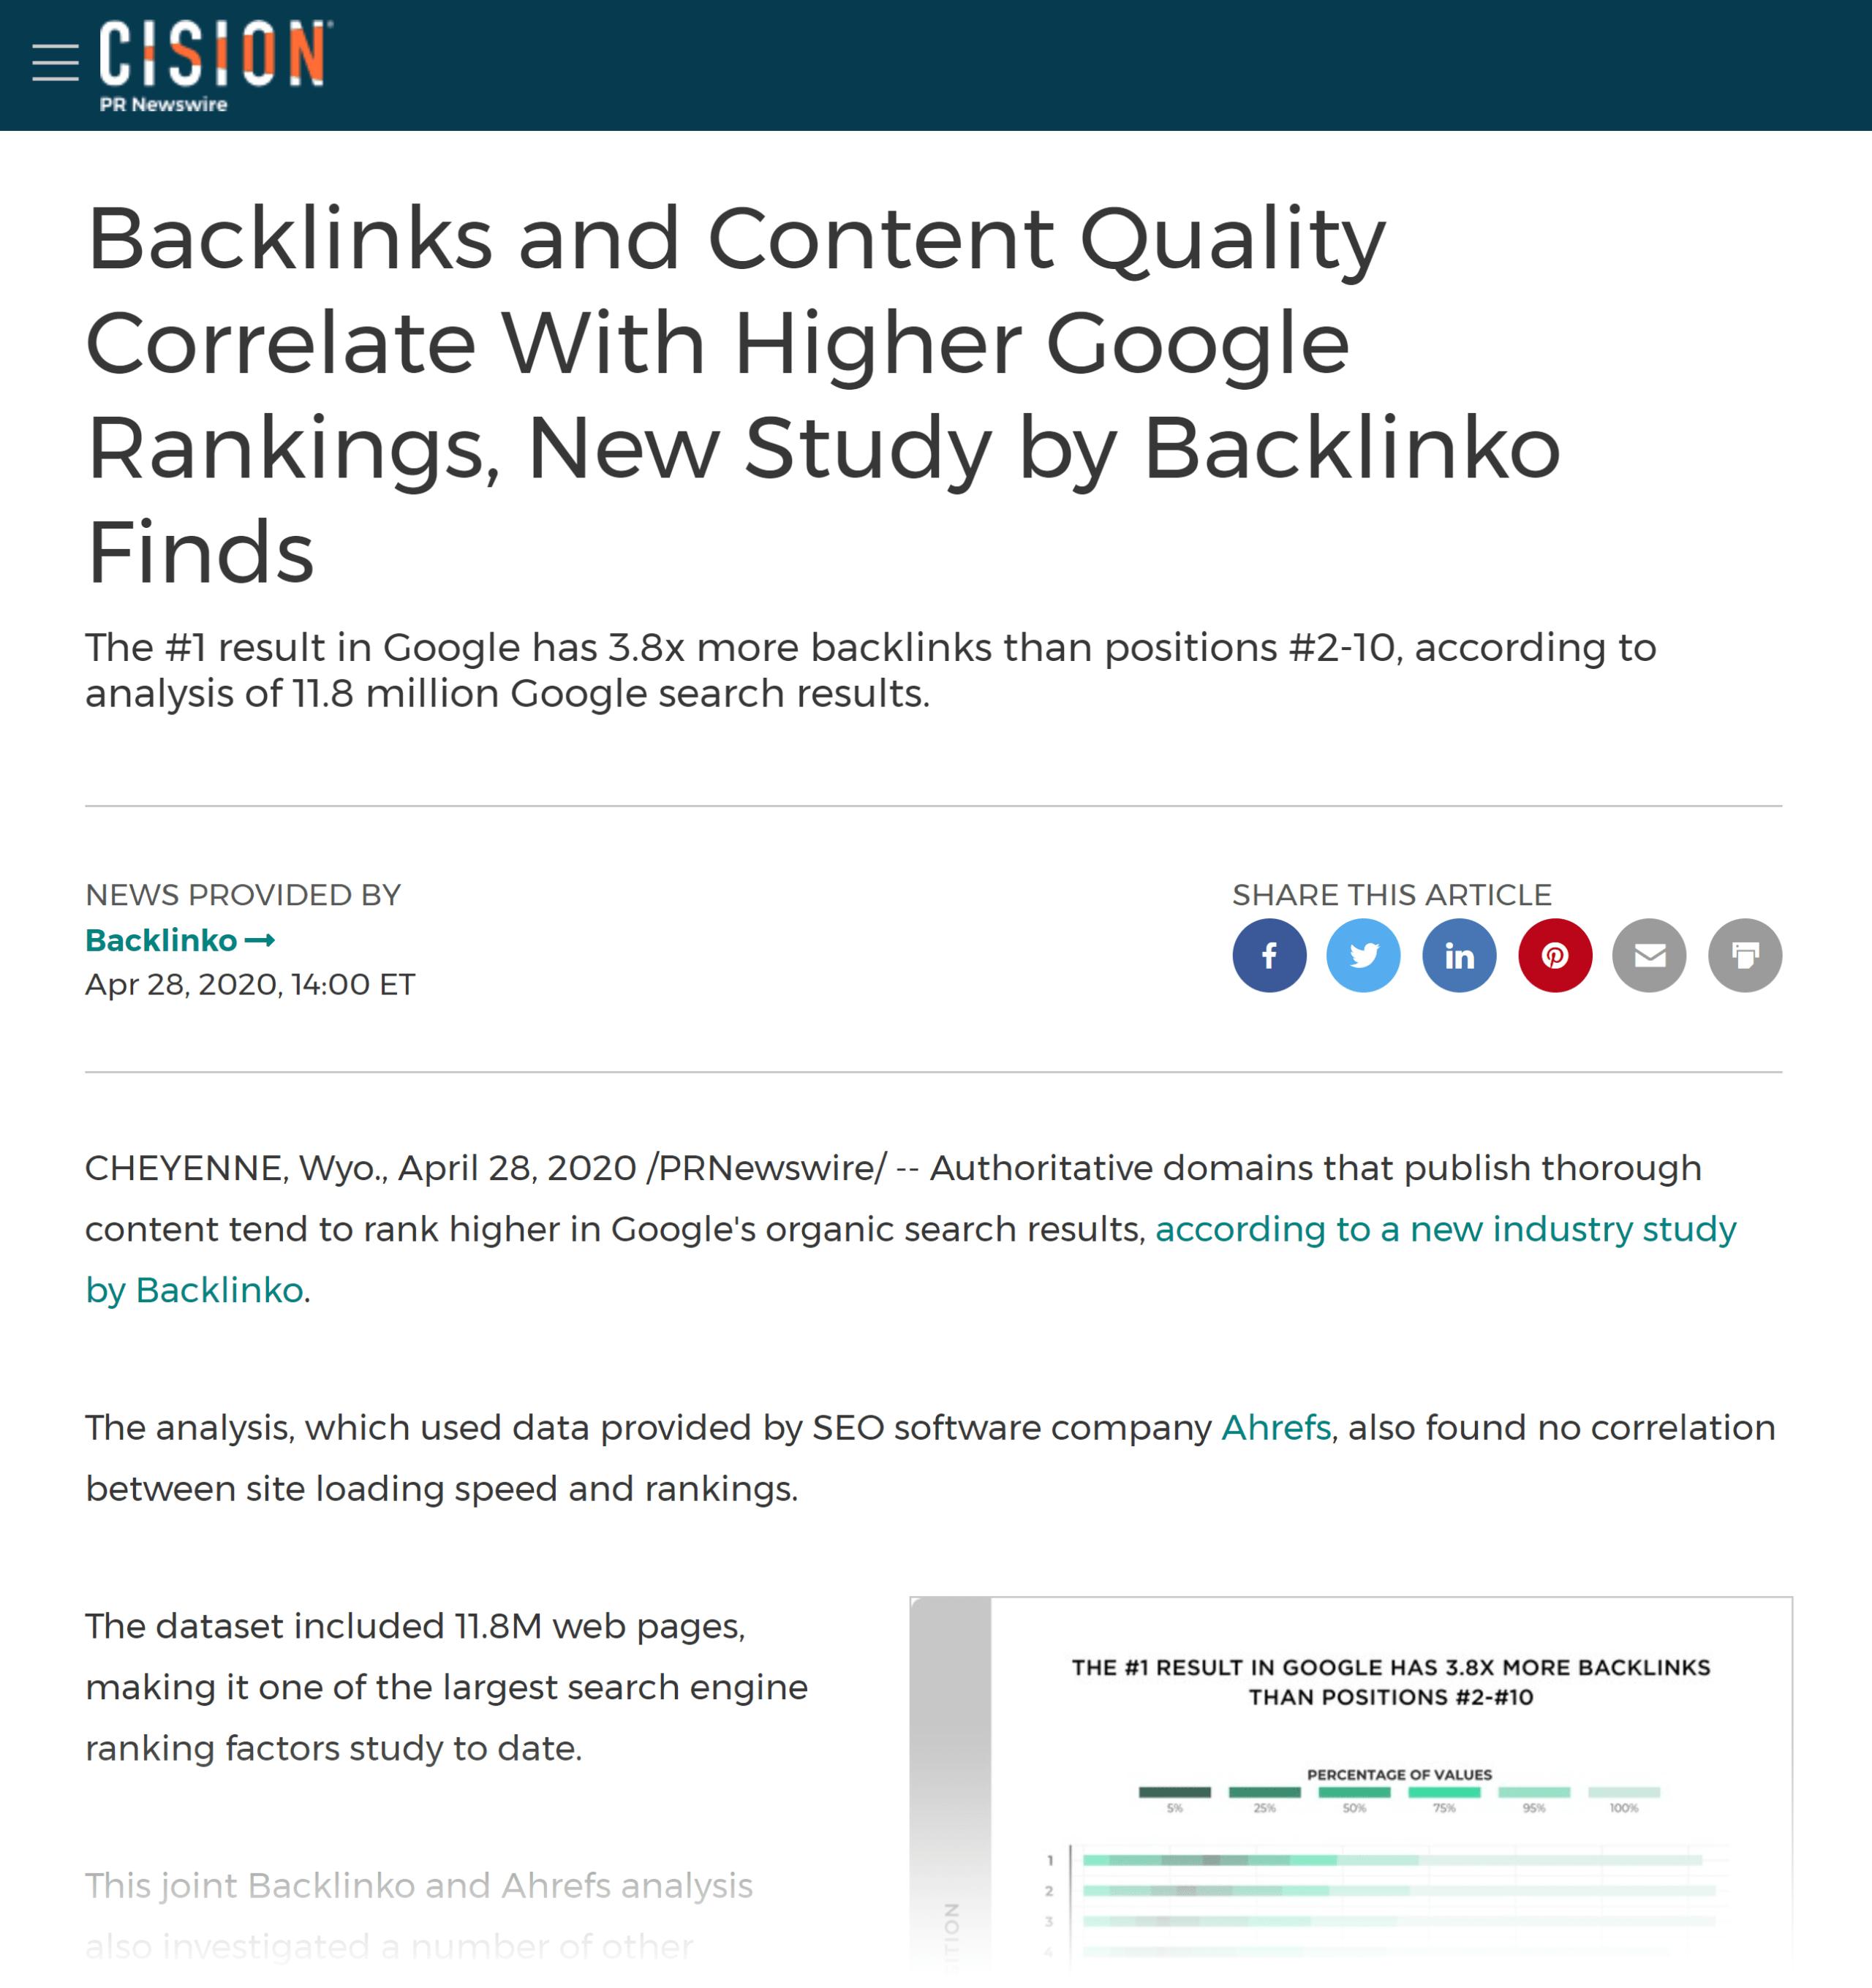 PR Newswire – Backlinko press release